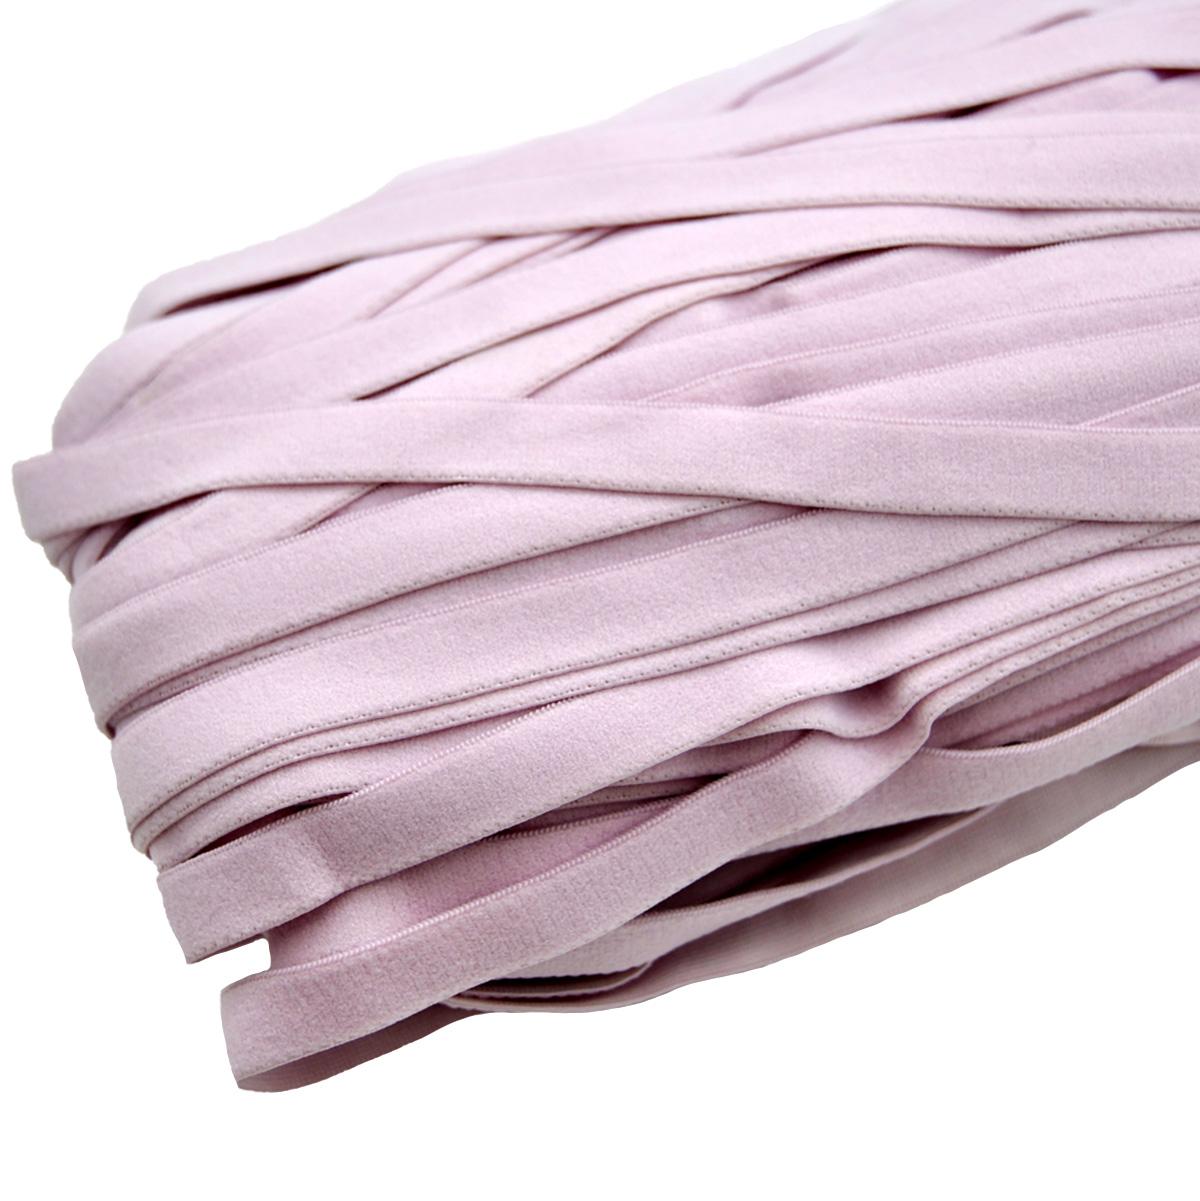 STD/67 эластичная отделочная лента 12мм*25м, розово-сиреневый